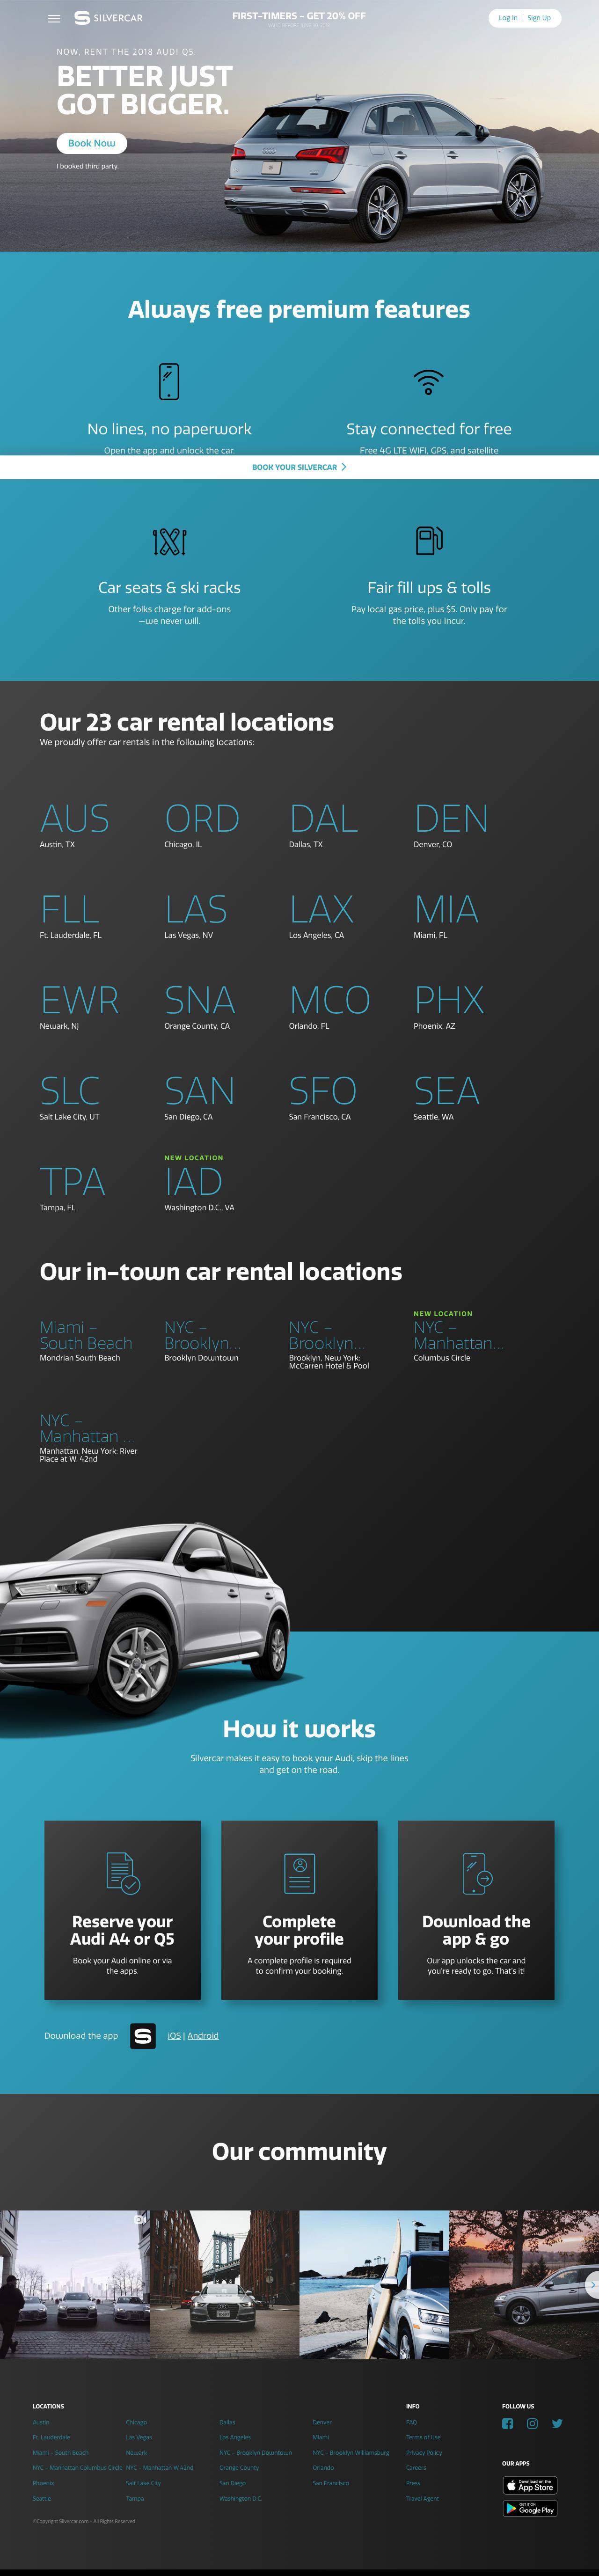 Screenshot of silvercar.com - Silvercar: Car Rental with No Lines & Free Premium Features - captured June 1, 2018